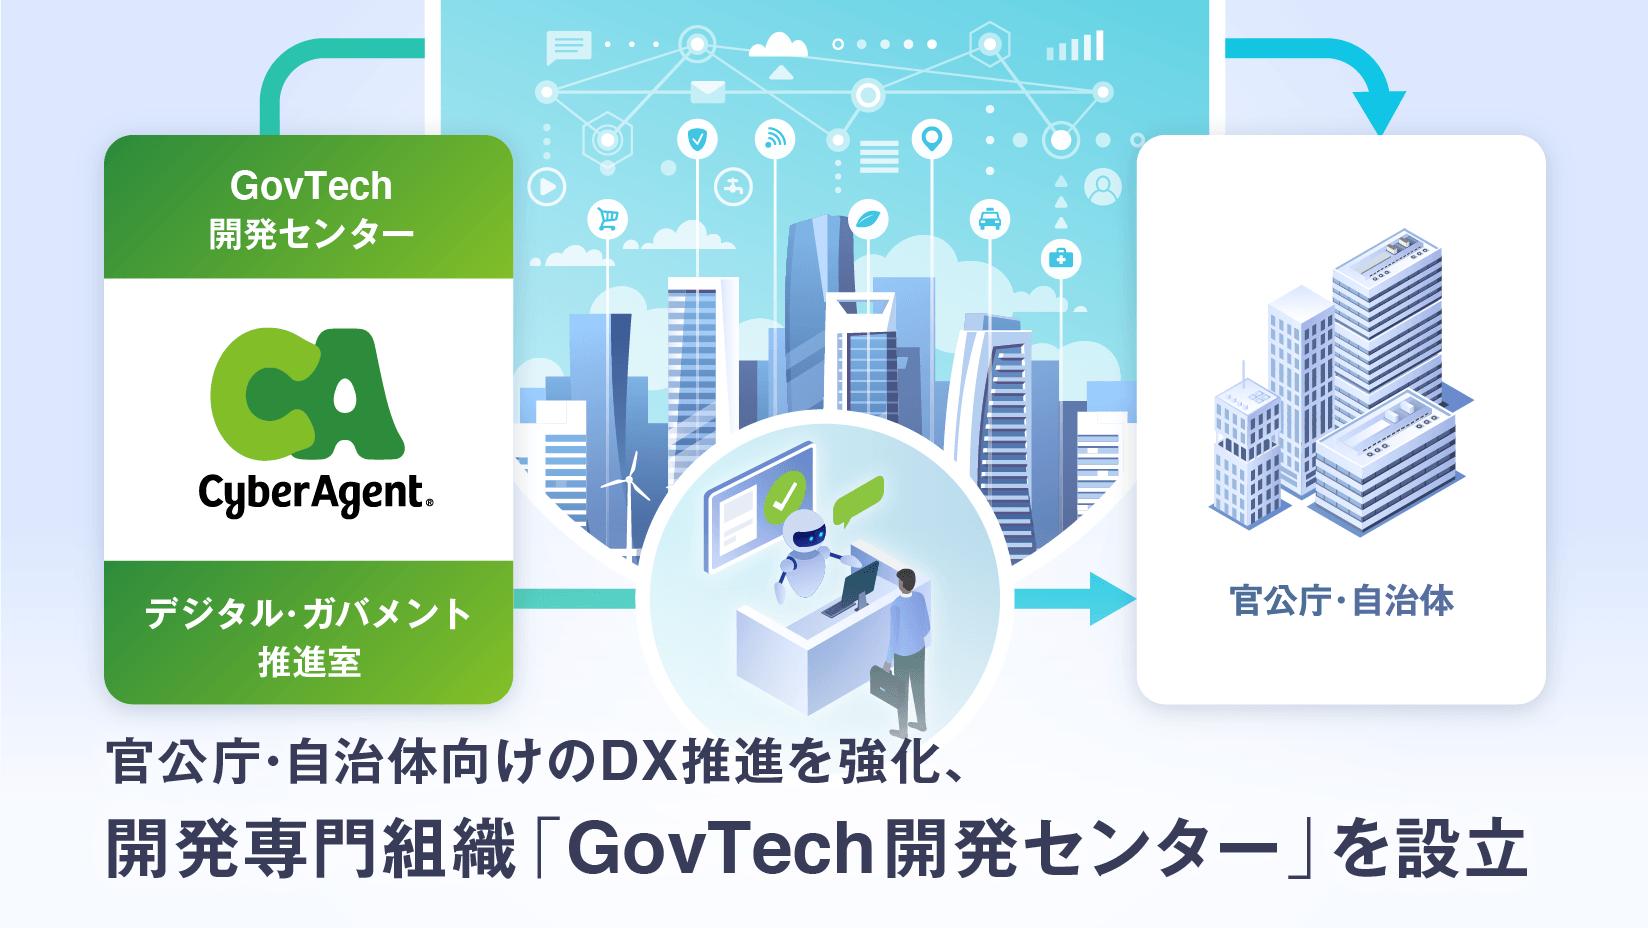 GovTech開発センター